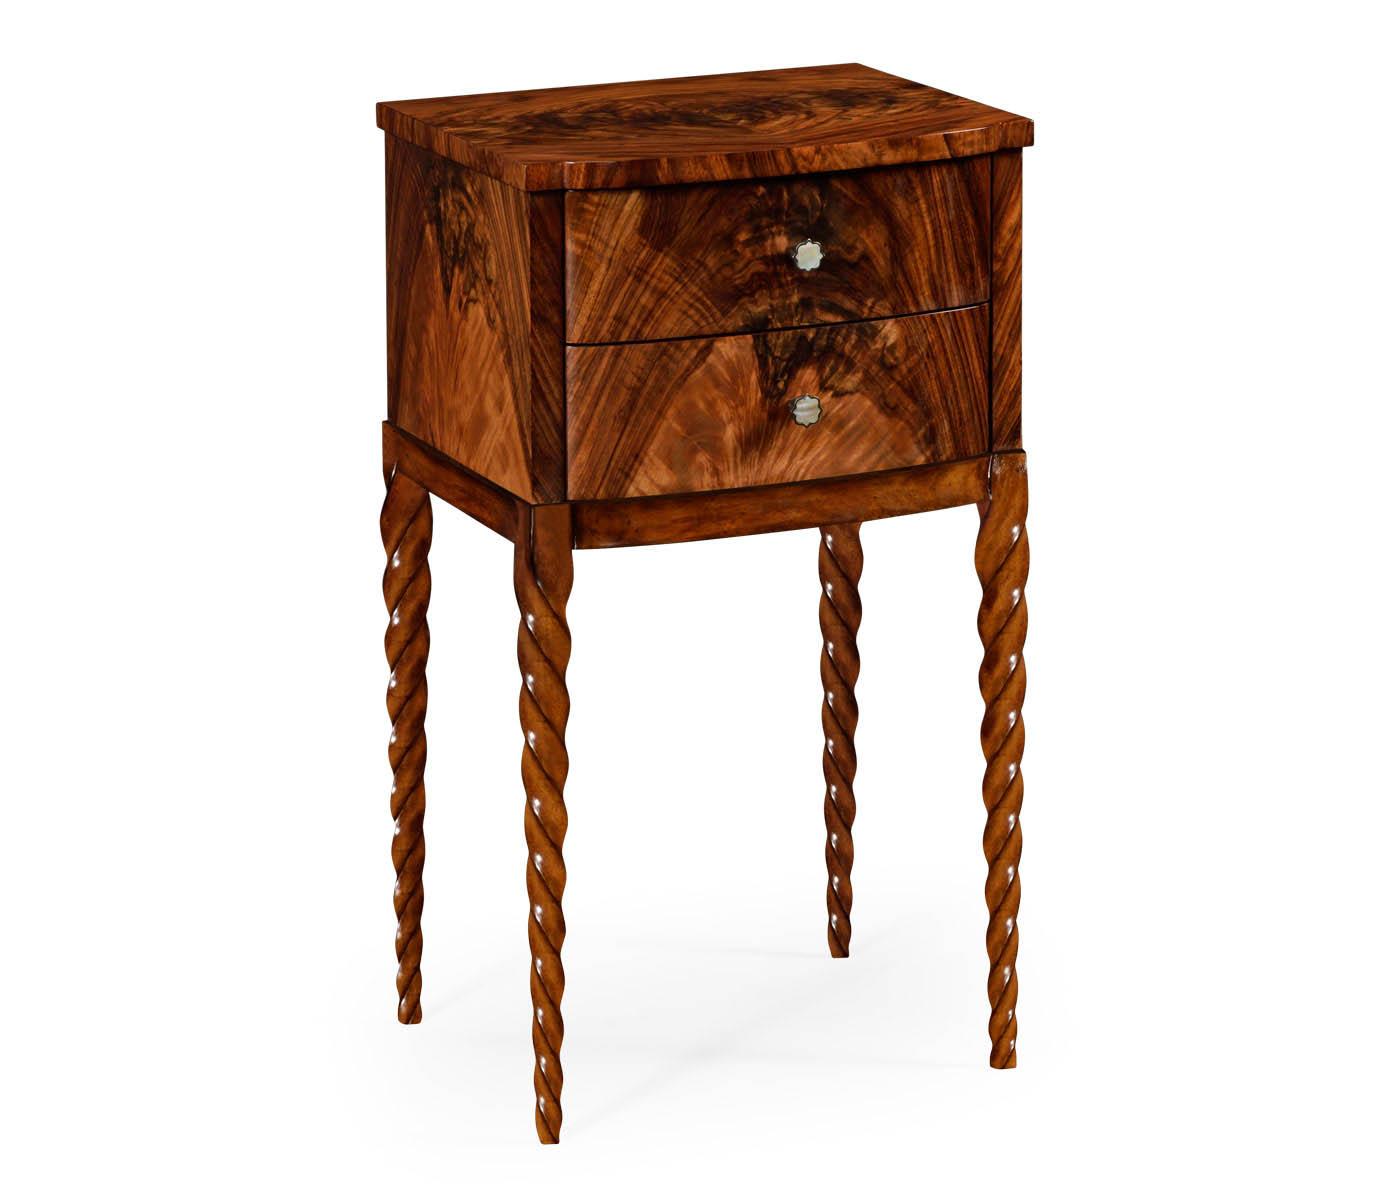 Barleytwist lamp table walnut barleytwist lamp table geotapseo Image collections